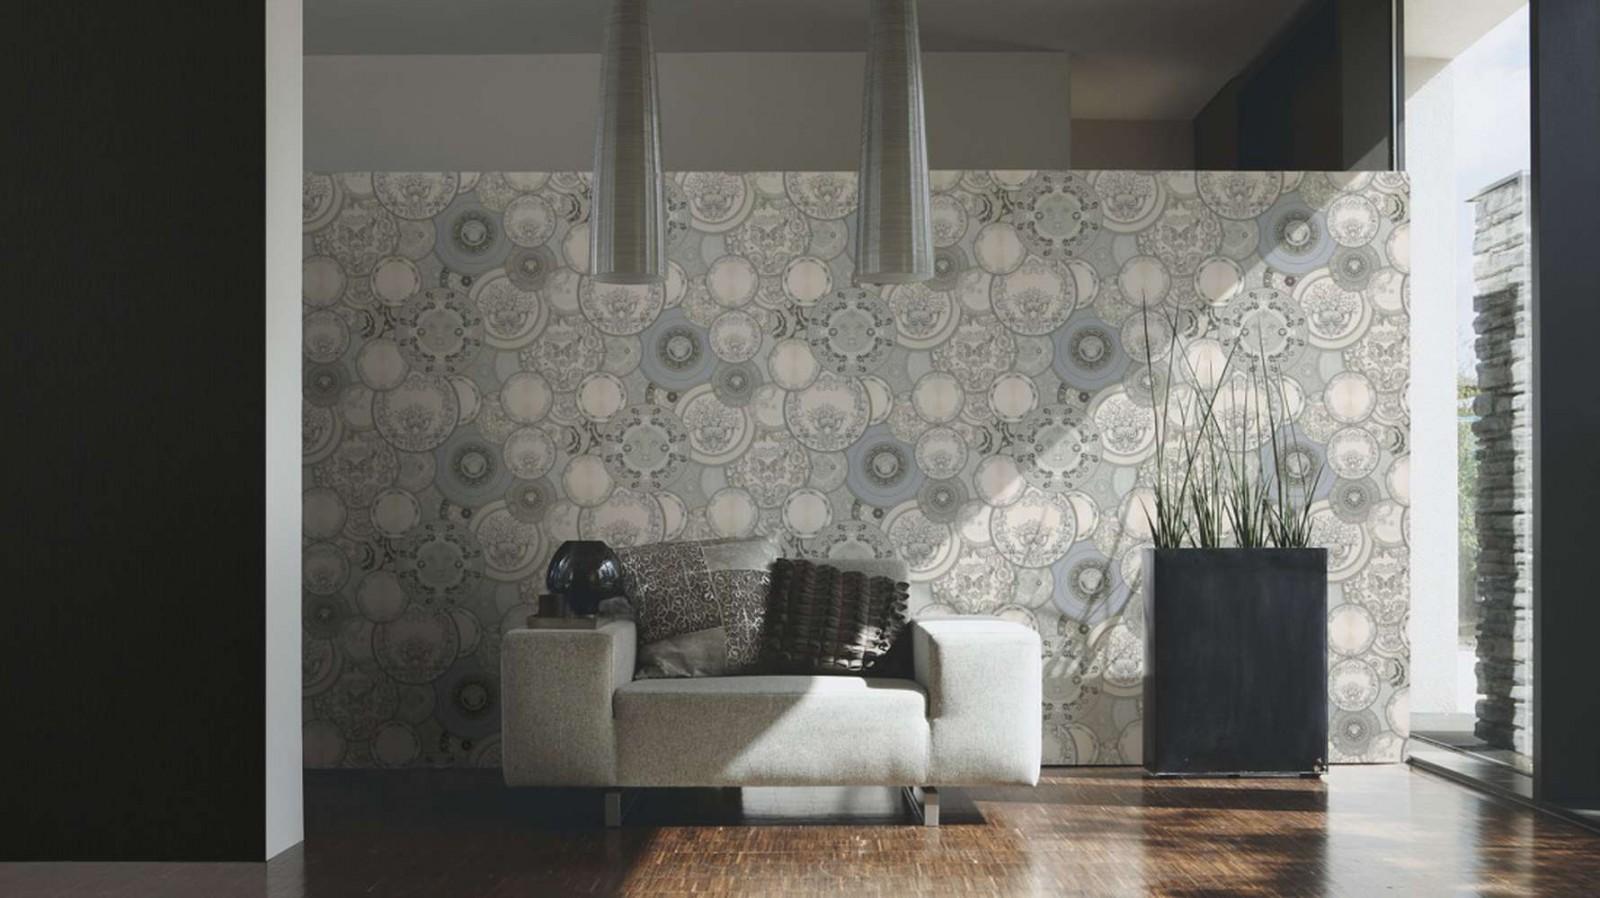 versace les etoiles de la mer wallpaper 34901 3 grey silver. Black Bedroom Furniture Sets. Home Design Ideas